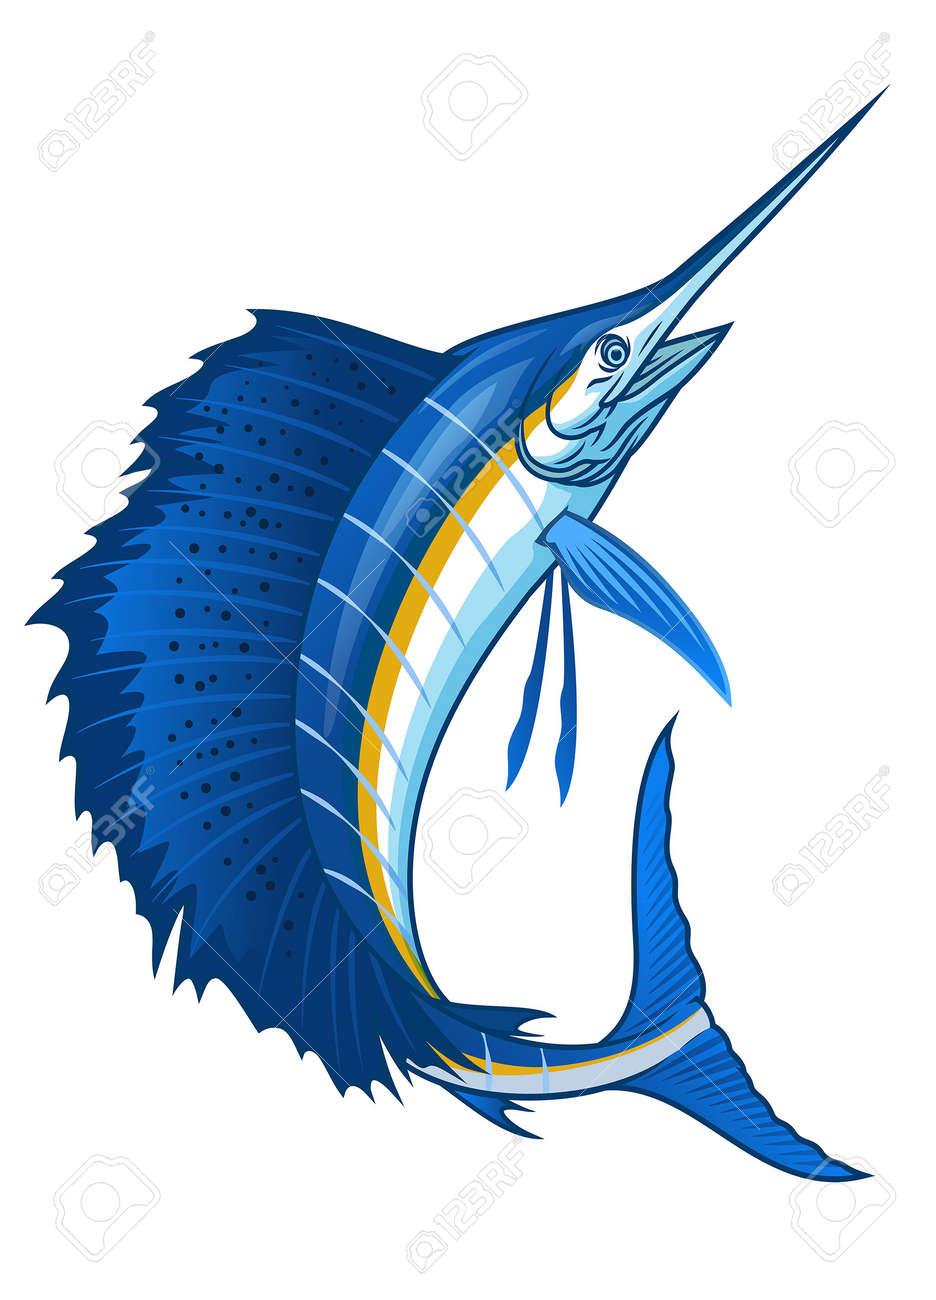 atlantic sailfish with big sail fin - 167532439